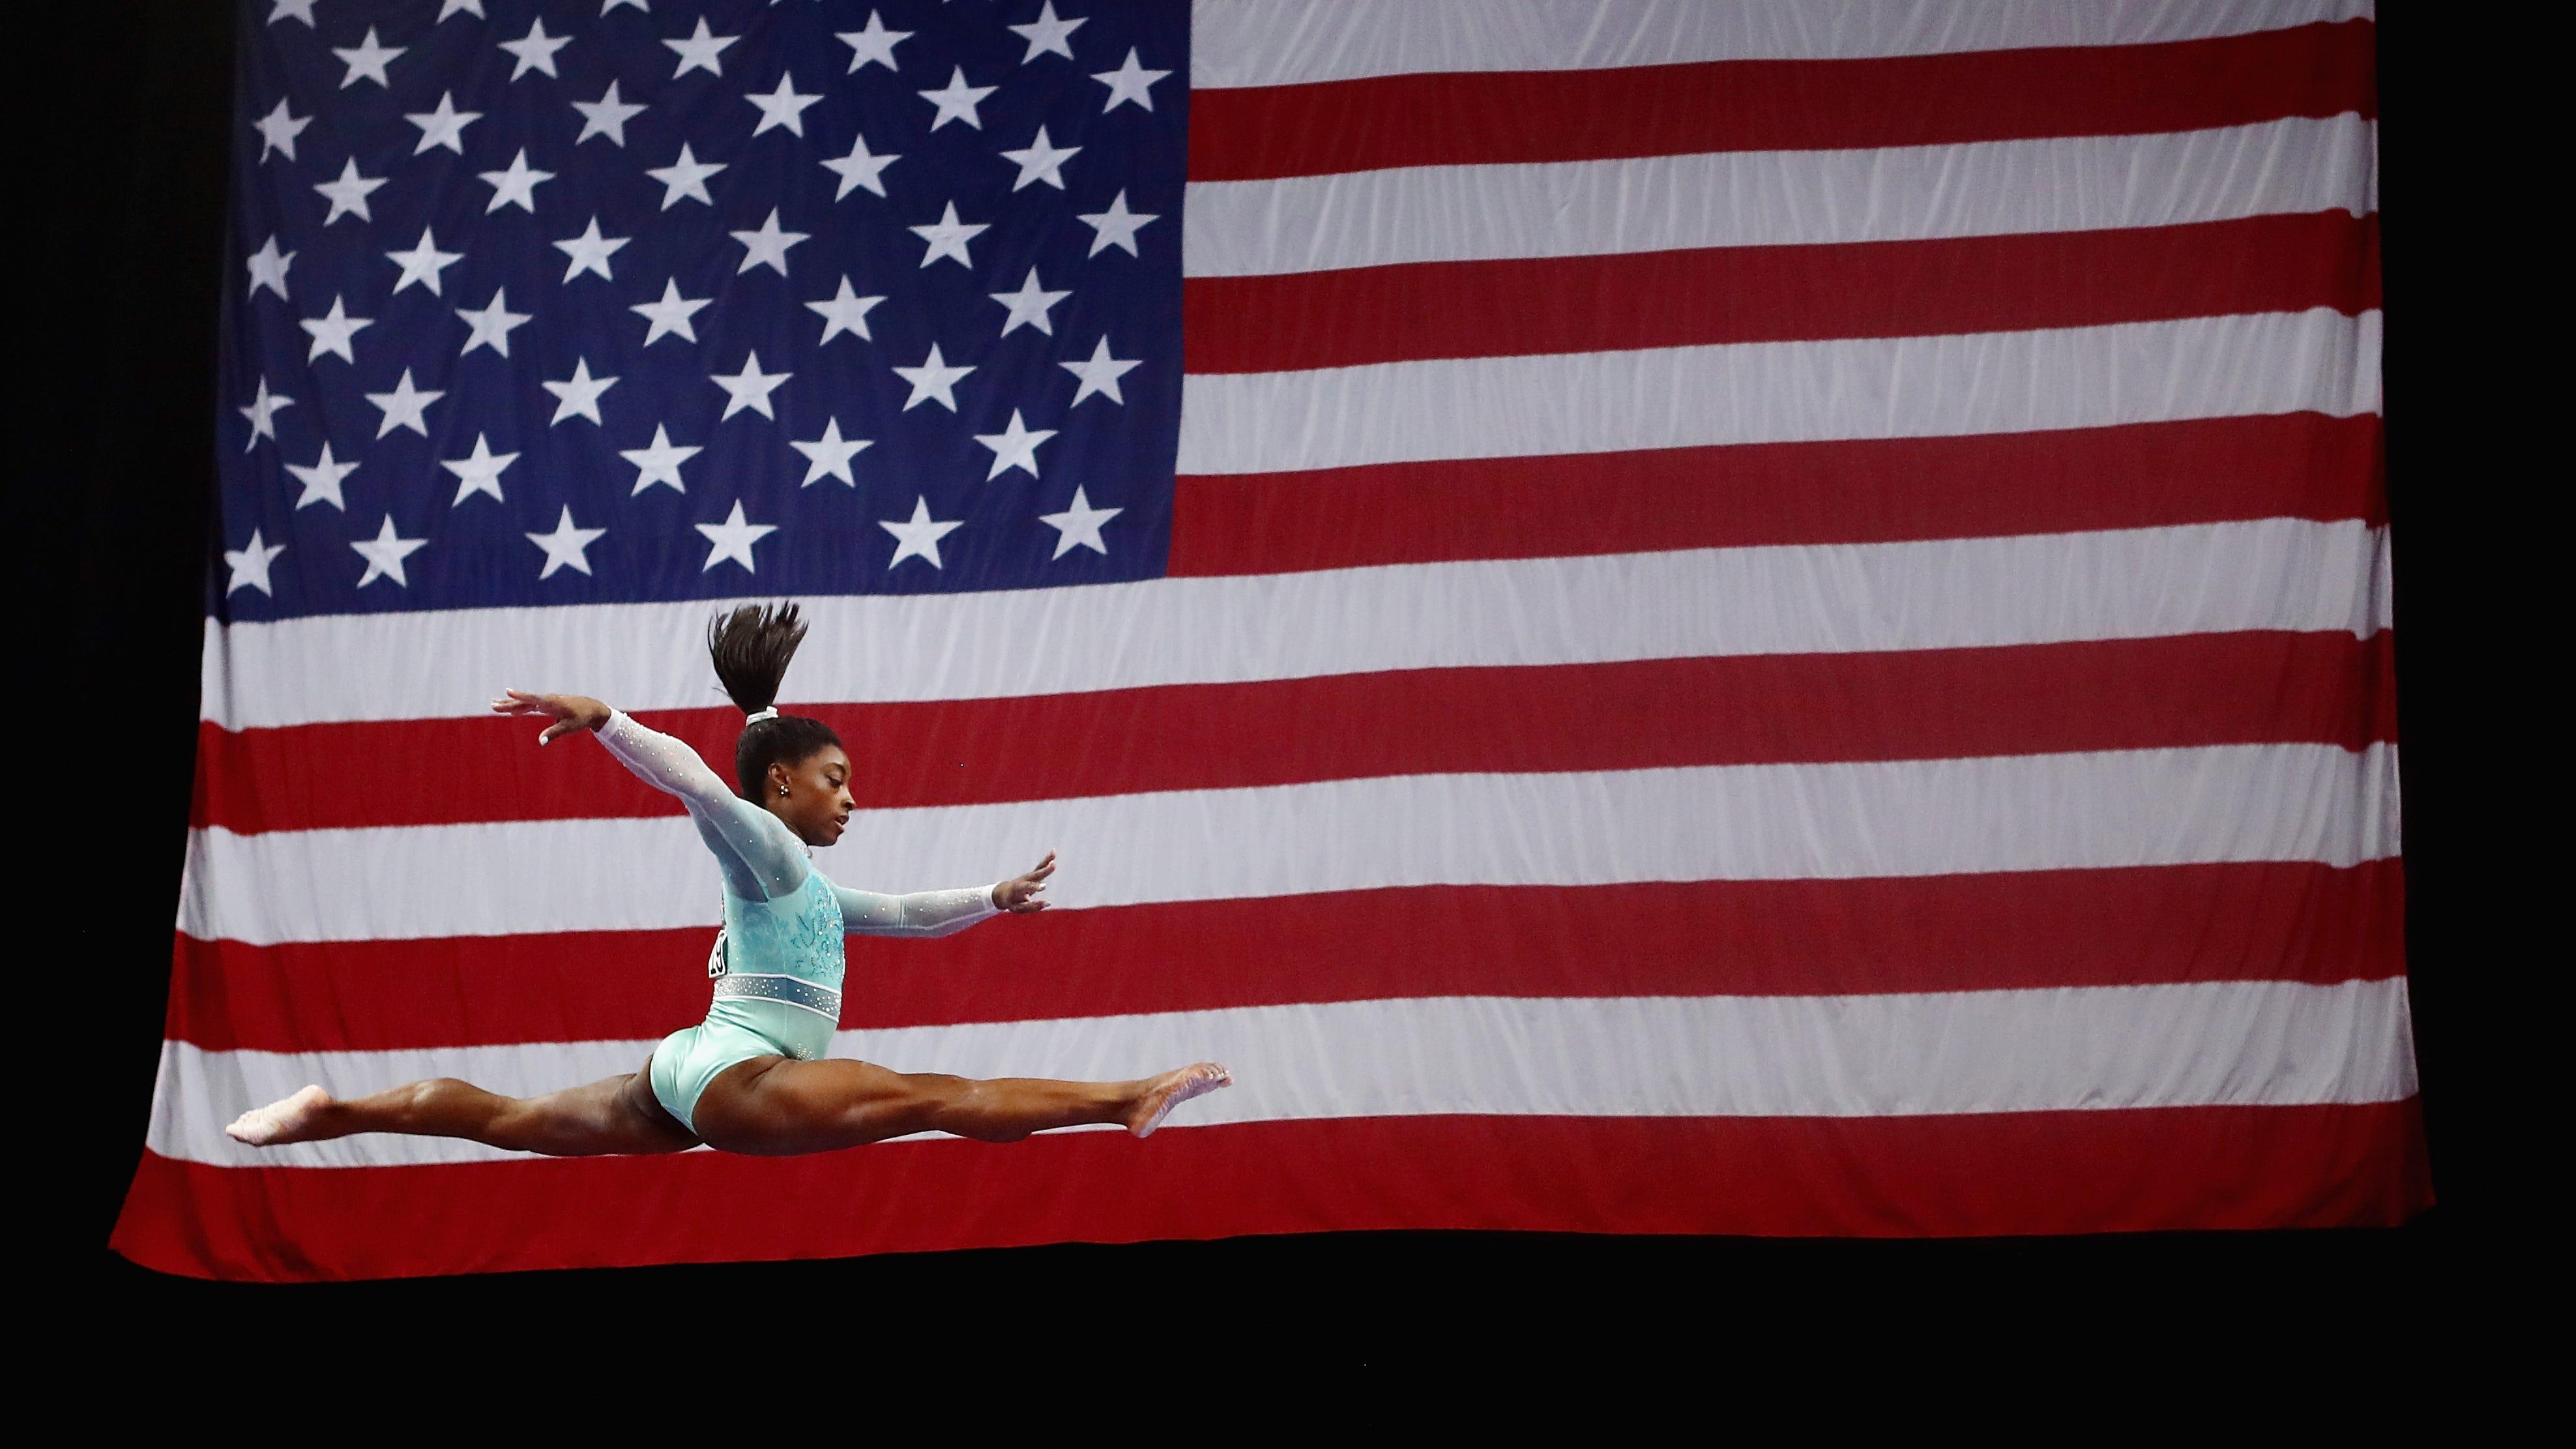 Simone Biles sweeps all-around, event titles at U.S. Gymnastics Championships